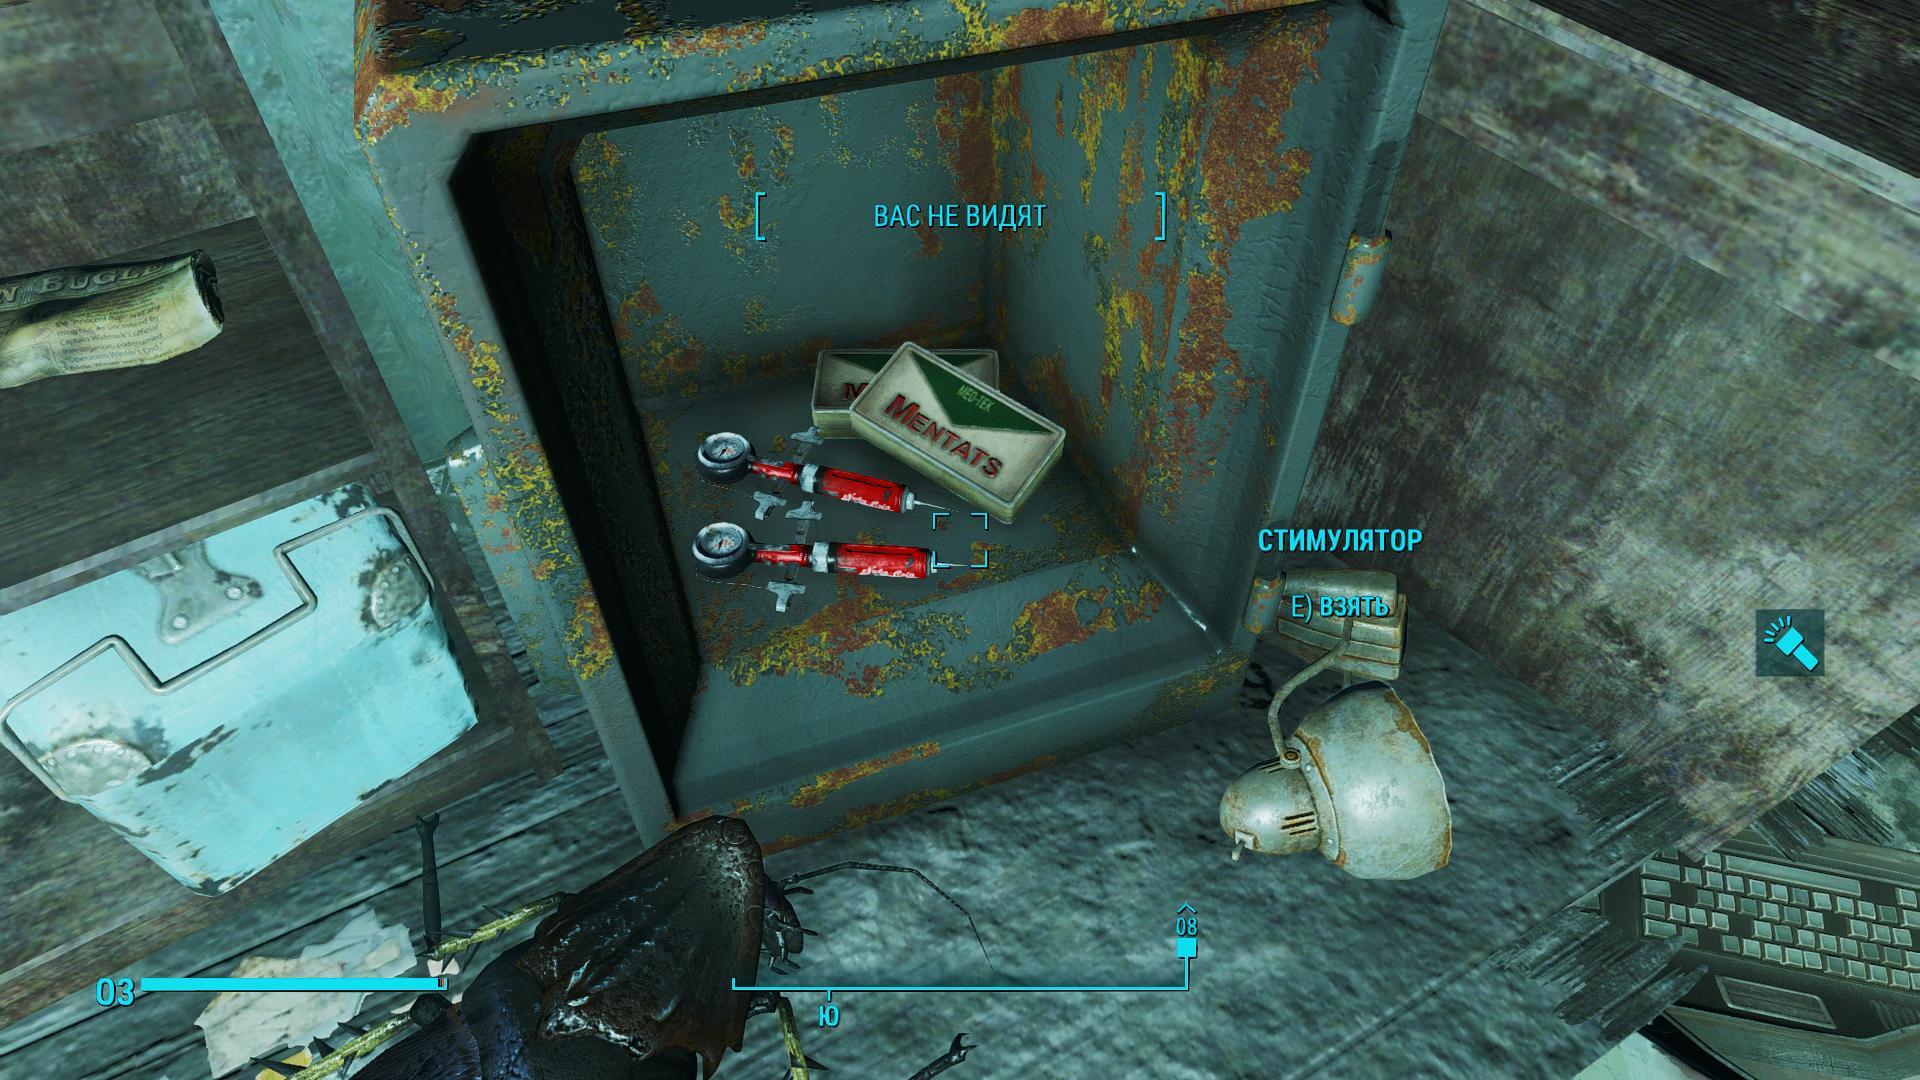 000517.Jpg - Fallout 4